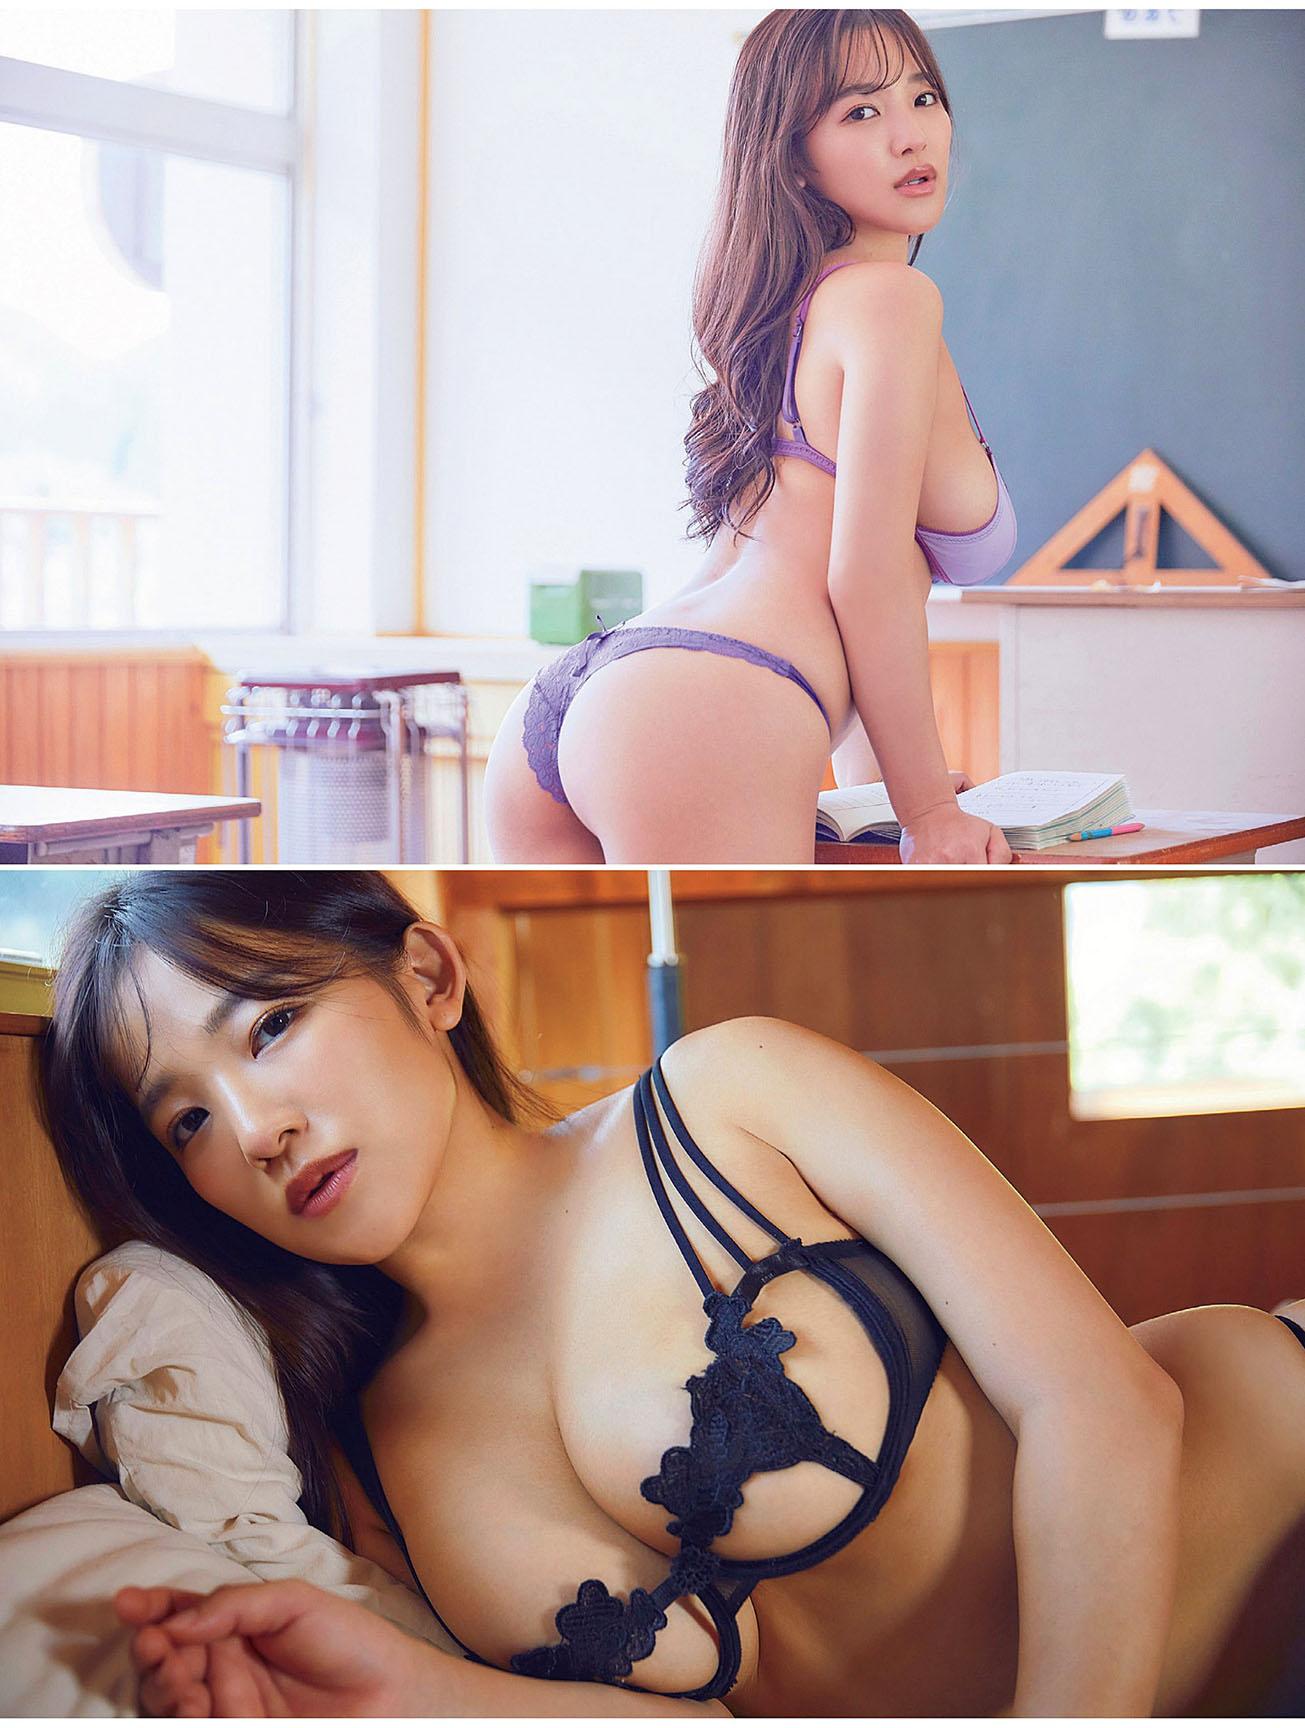 Jun Amaki Flash 211012 05.jpg